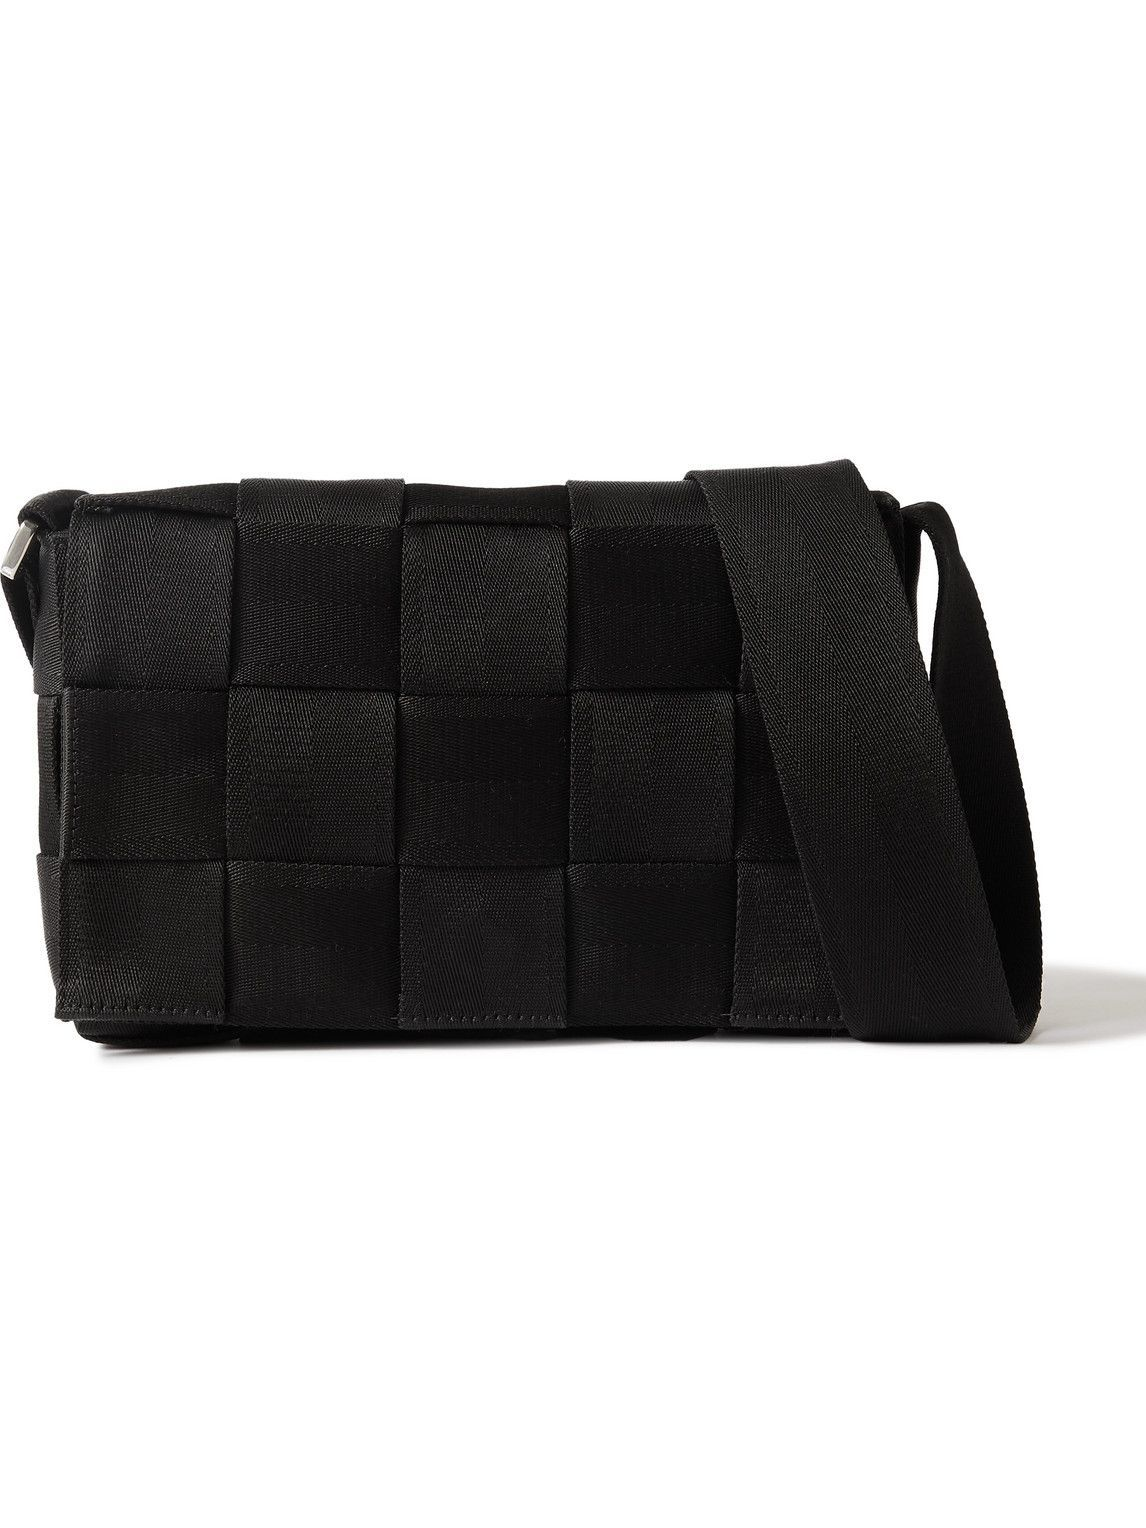 Photo: Bottega Veneta - Intrecciato Webbing Messenger Bag